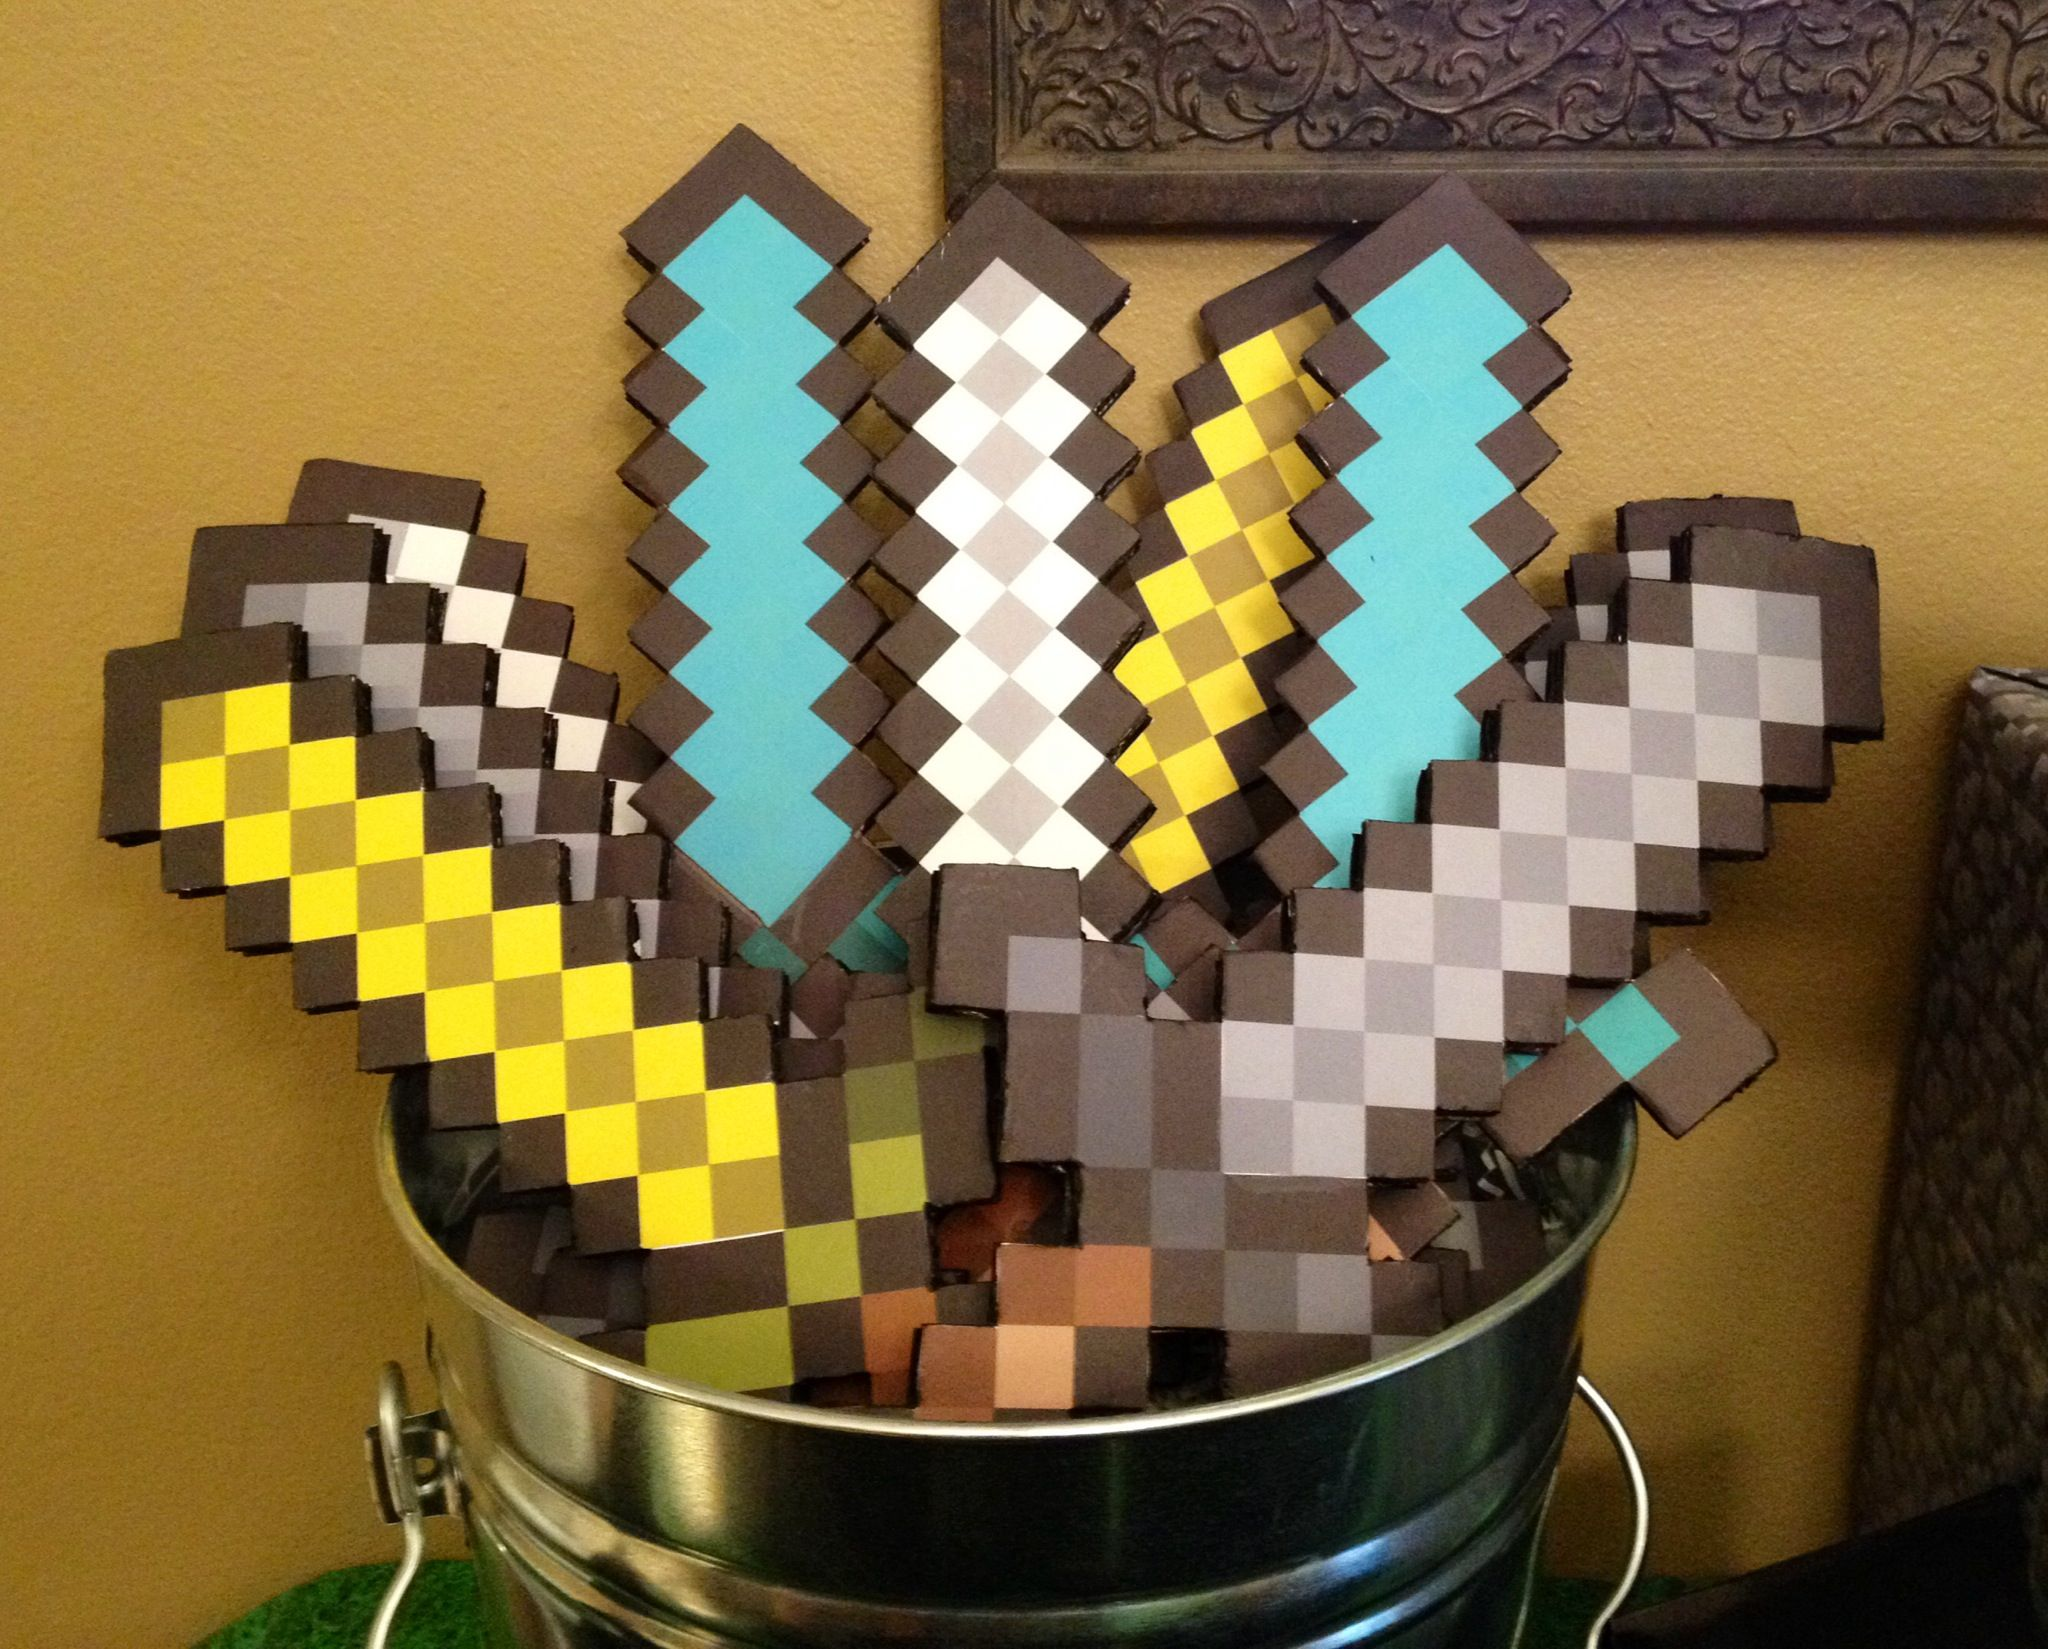 Mine craft birthday ideas - Handmade Minecraft Swords Using Free Printable Sword Cut Out And Glued To Double Foam Board Minecraft Birthday Ideasminecraft